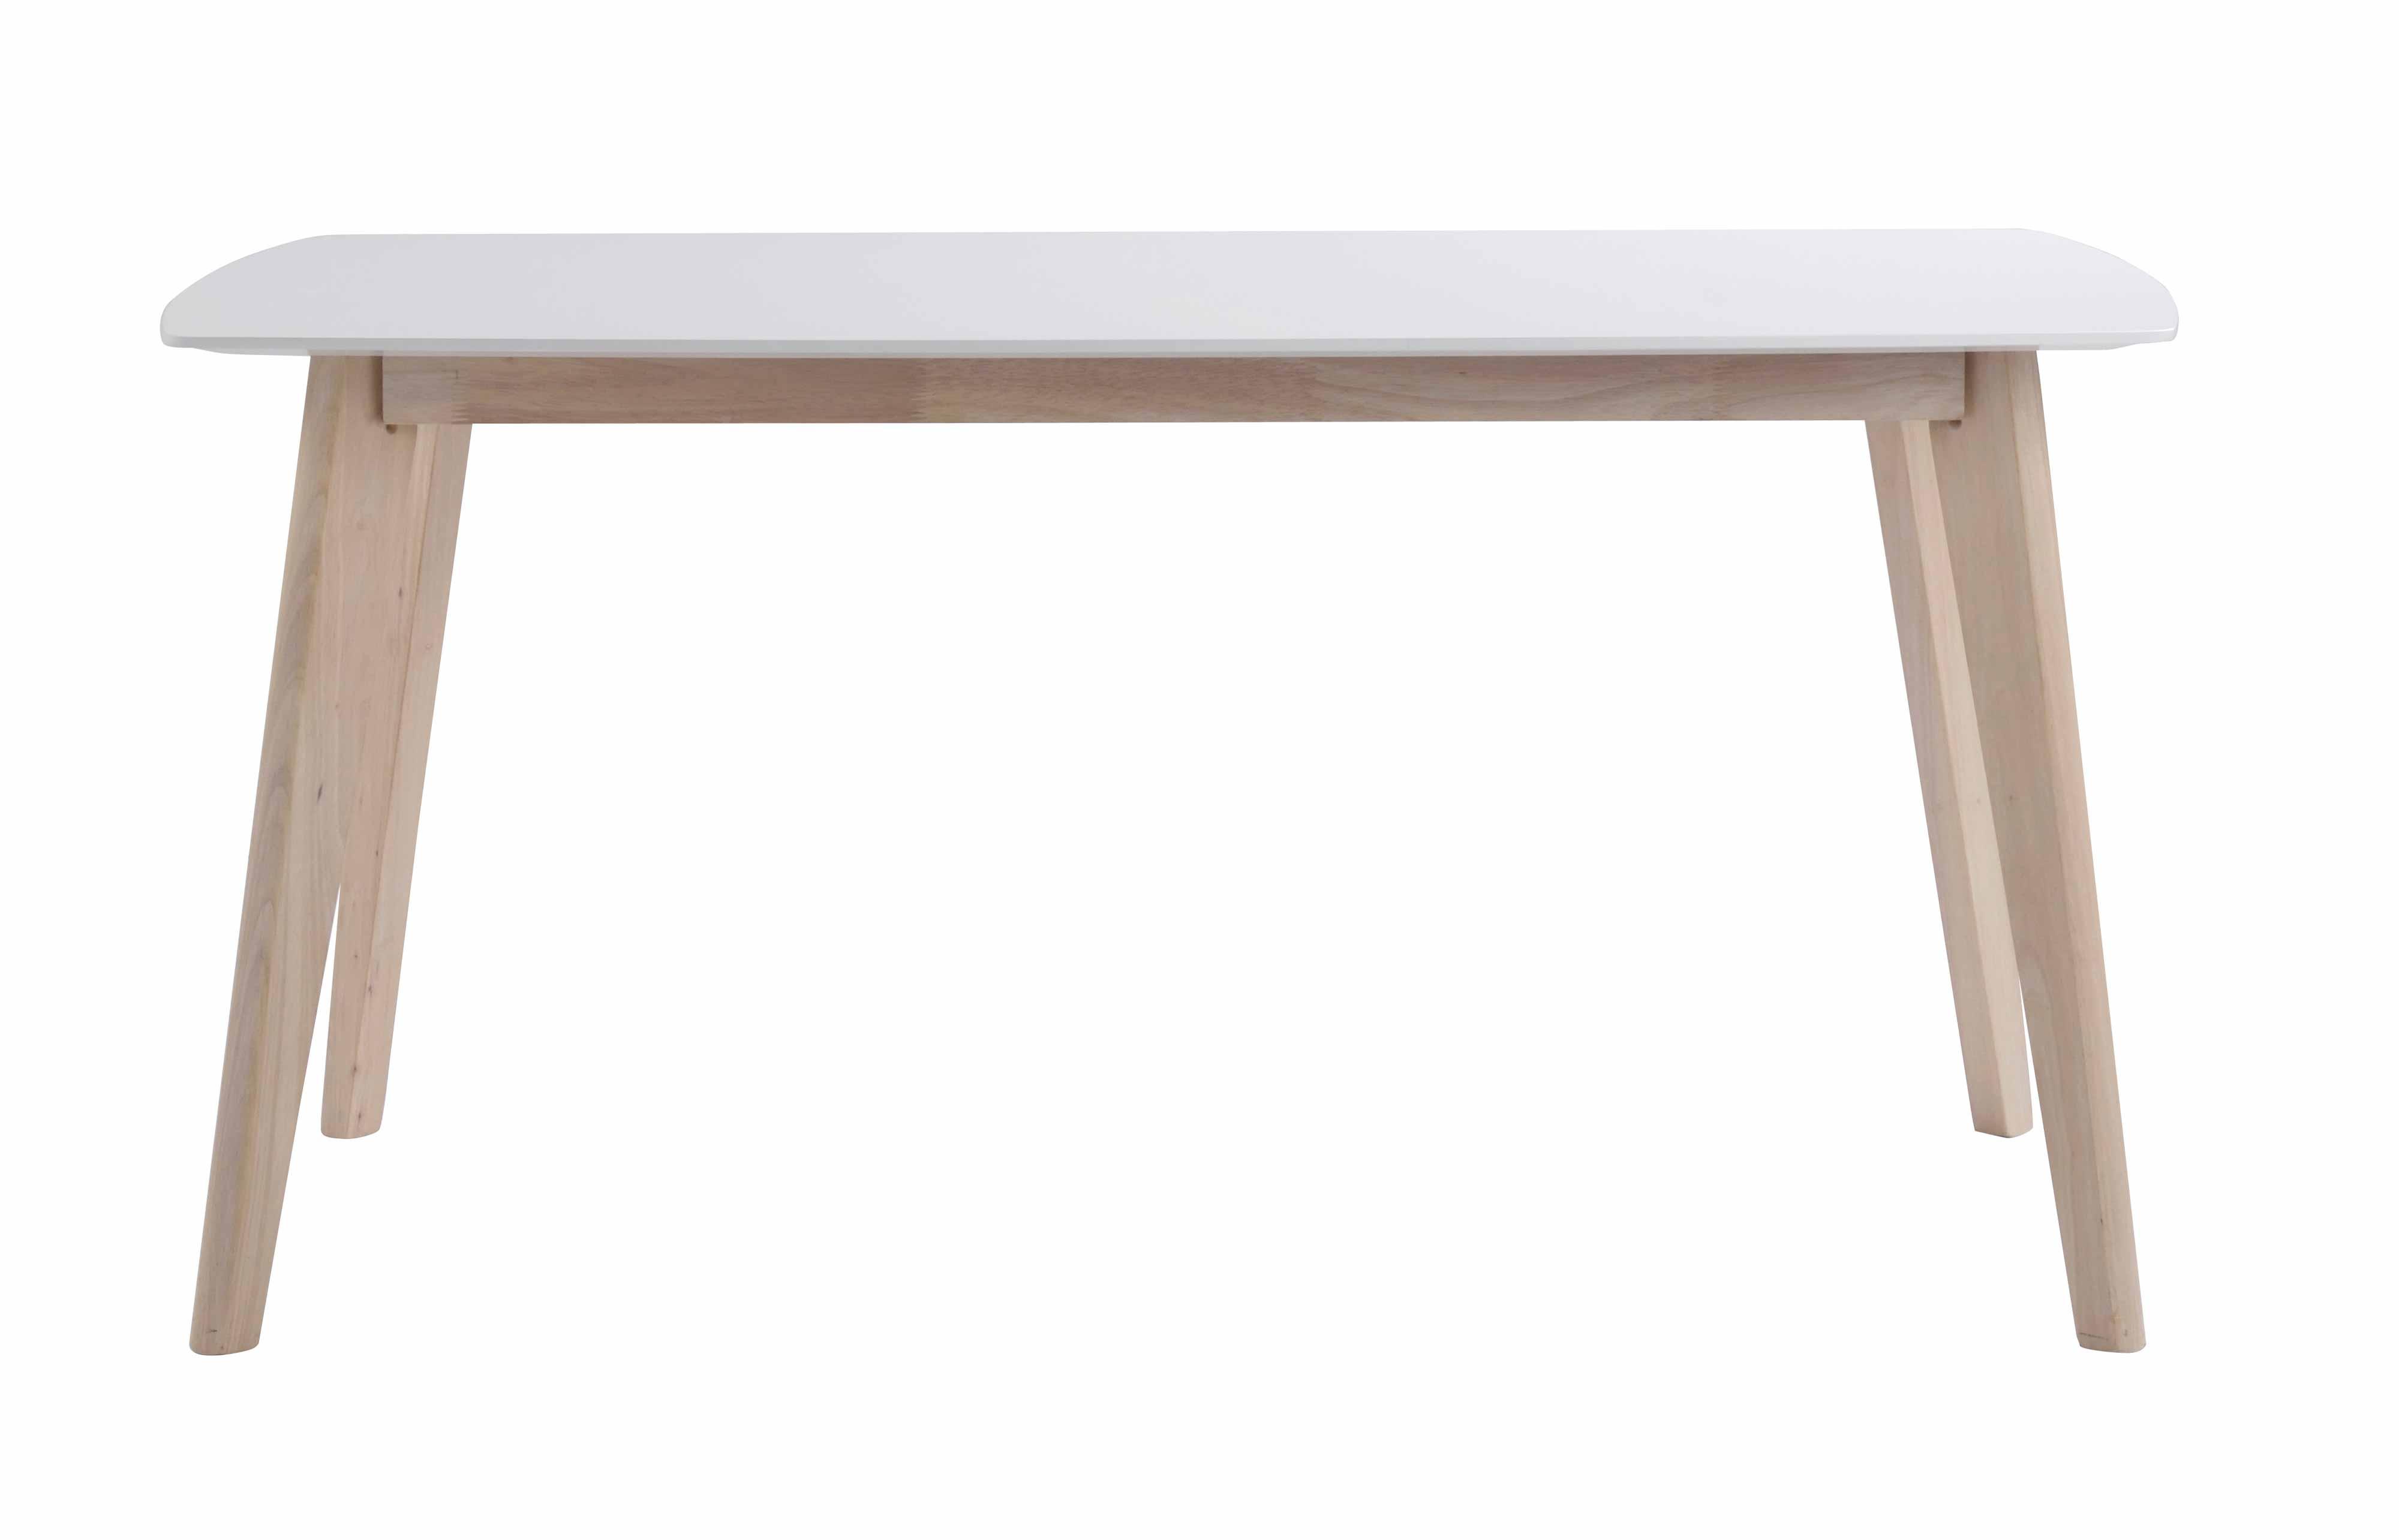 Sanna spisebord - Hvidpigmenteret træ, 150x90